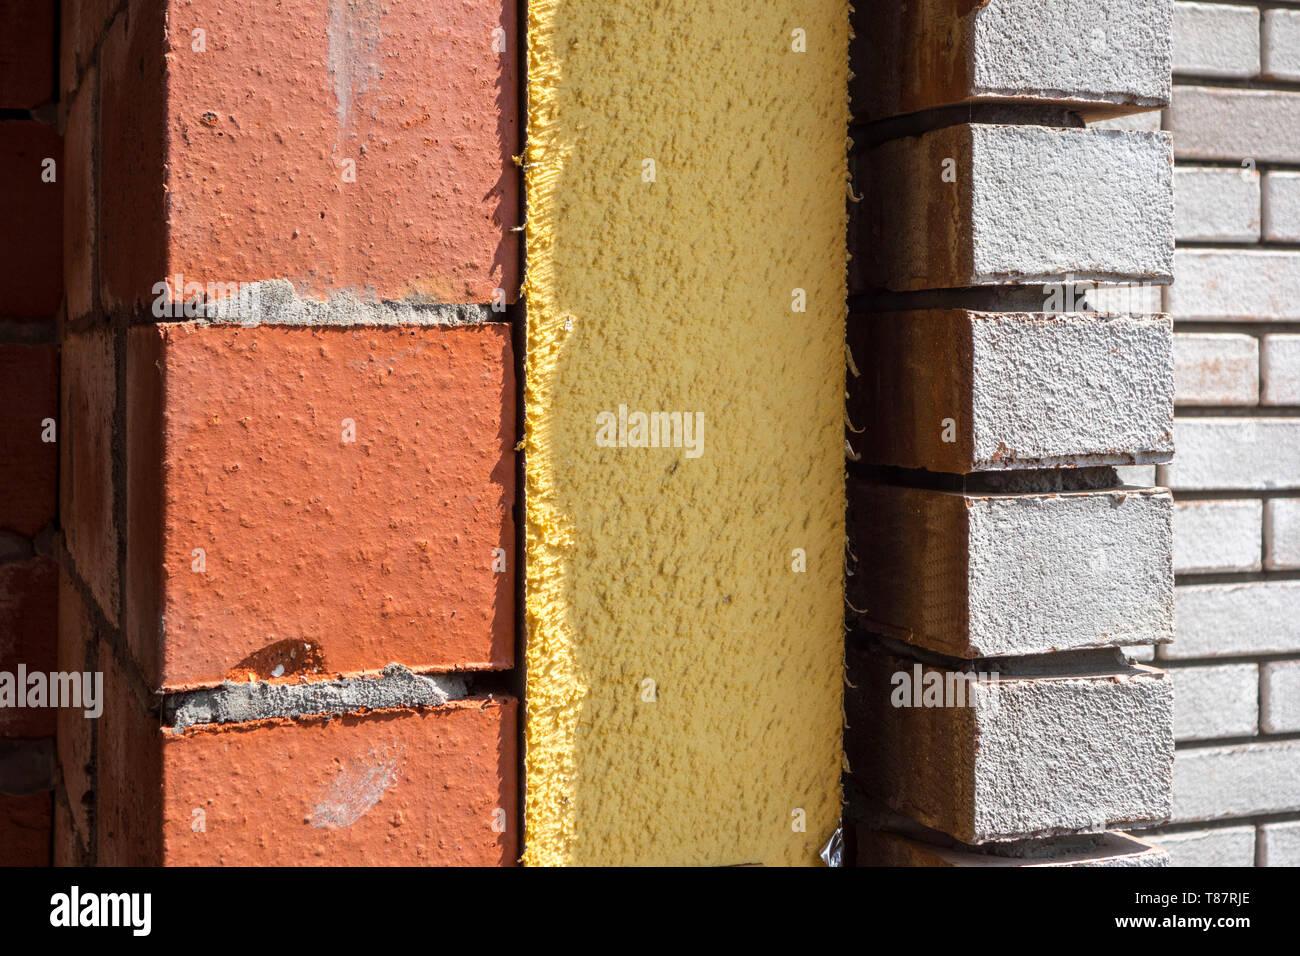 Cavity Wall Stock Photos & Cavity Wall Stock Images - Alamy